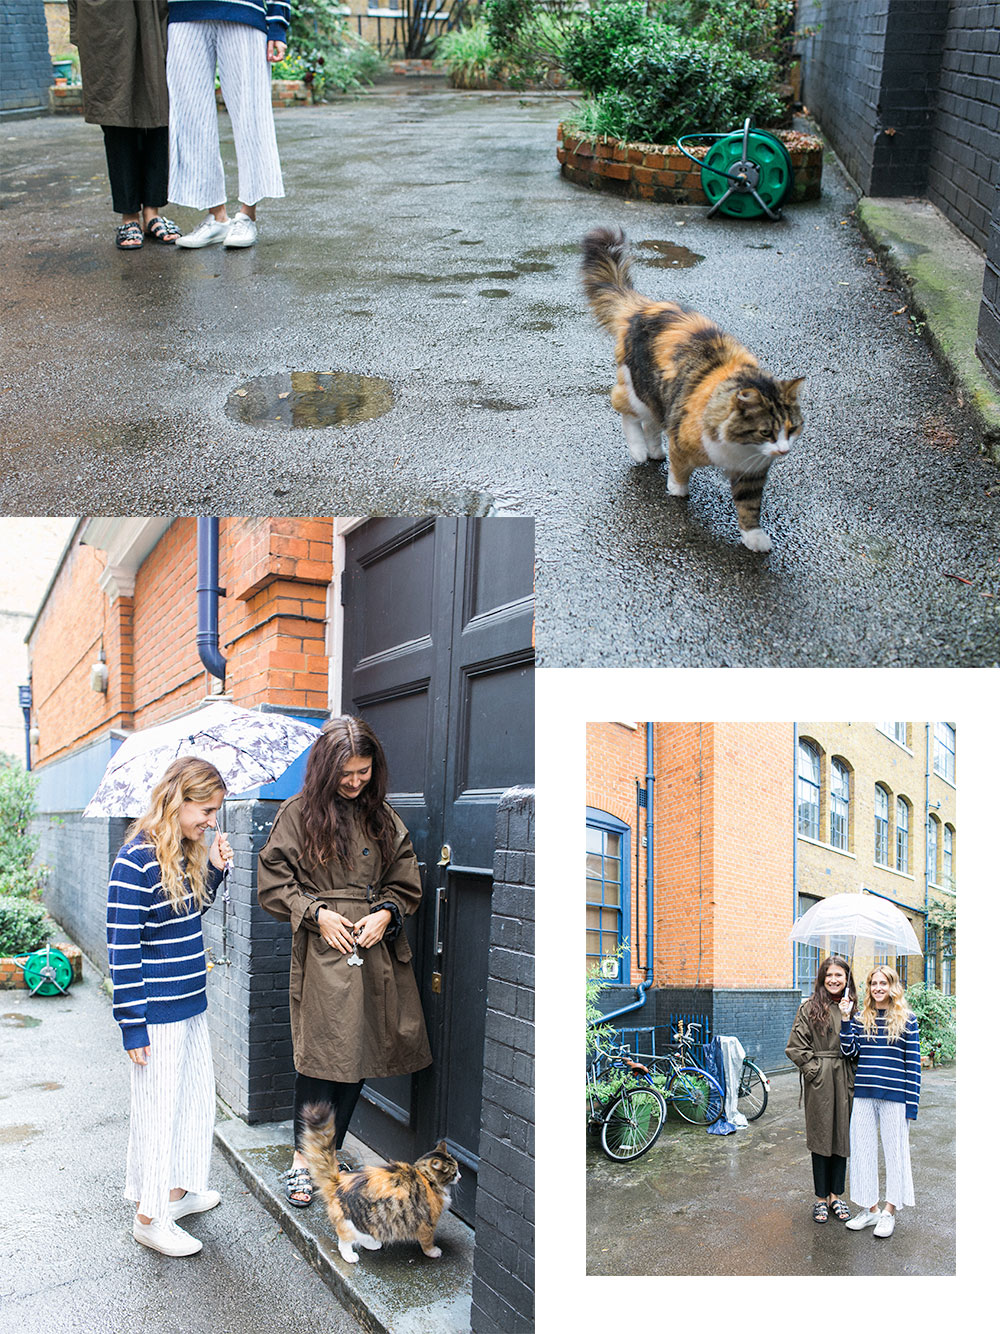 Femtastics-Christie-Rosanna-Wollenberg-London-cat